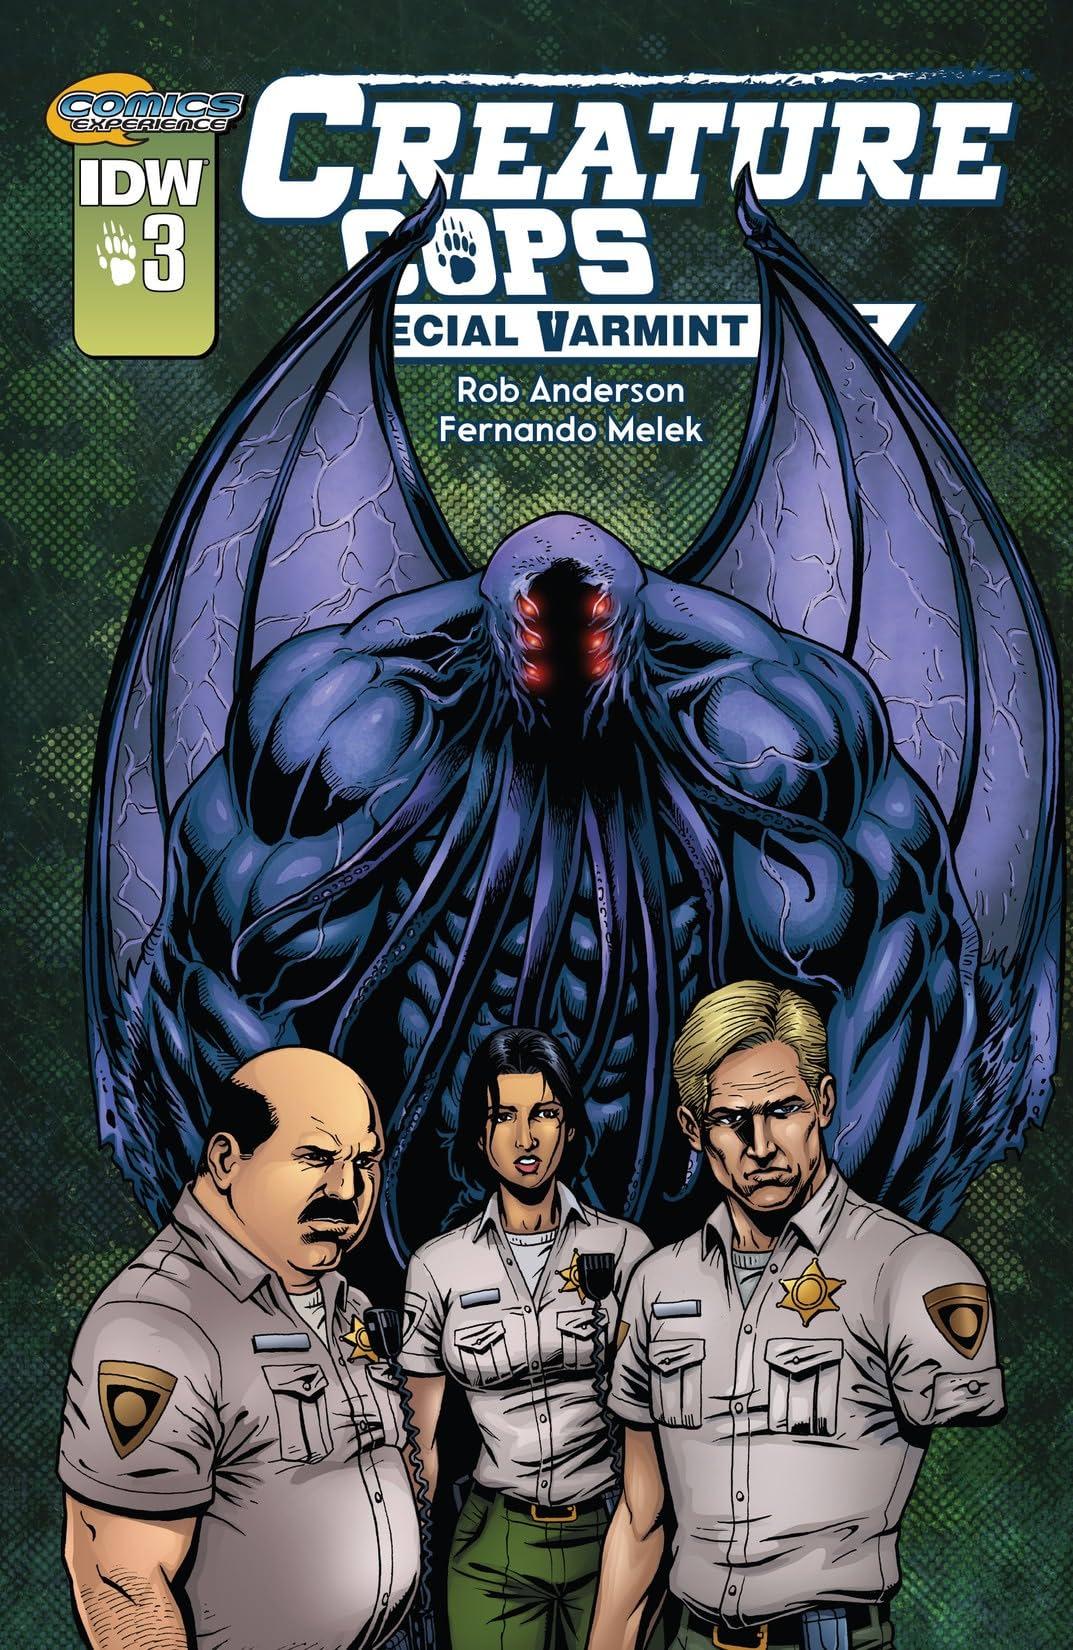 Creature Cops: Special Varmint Unit #3 (of 3)